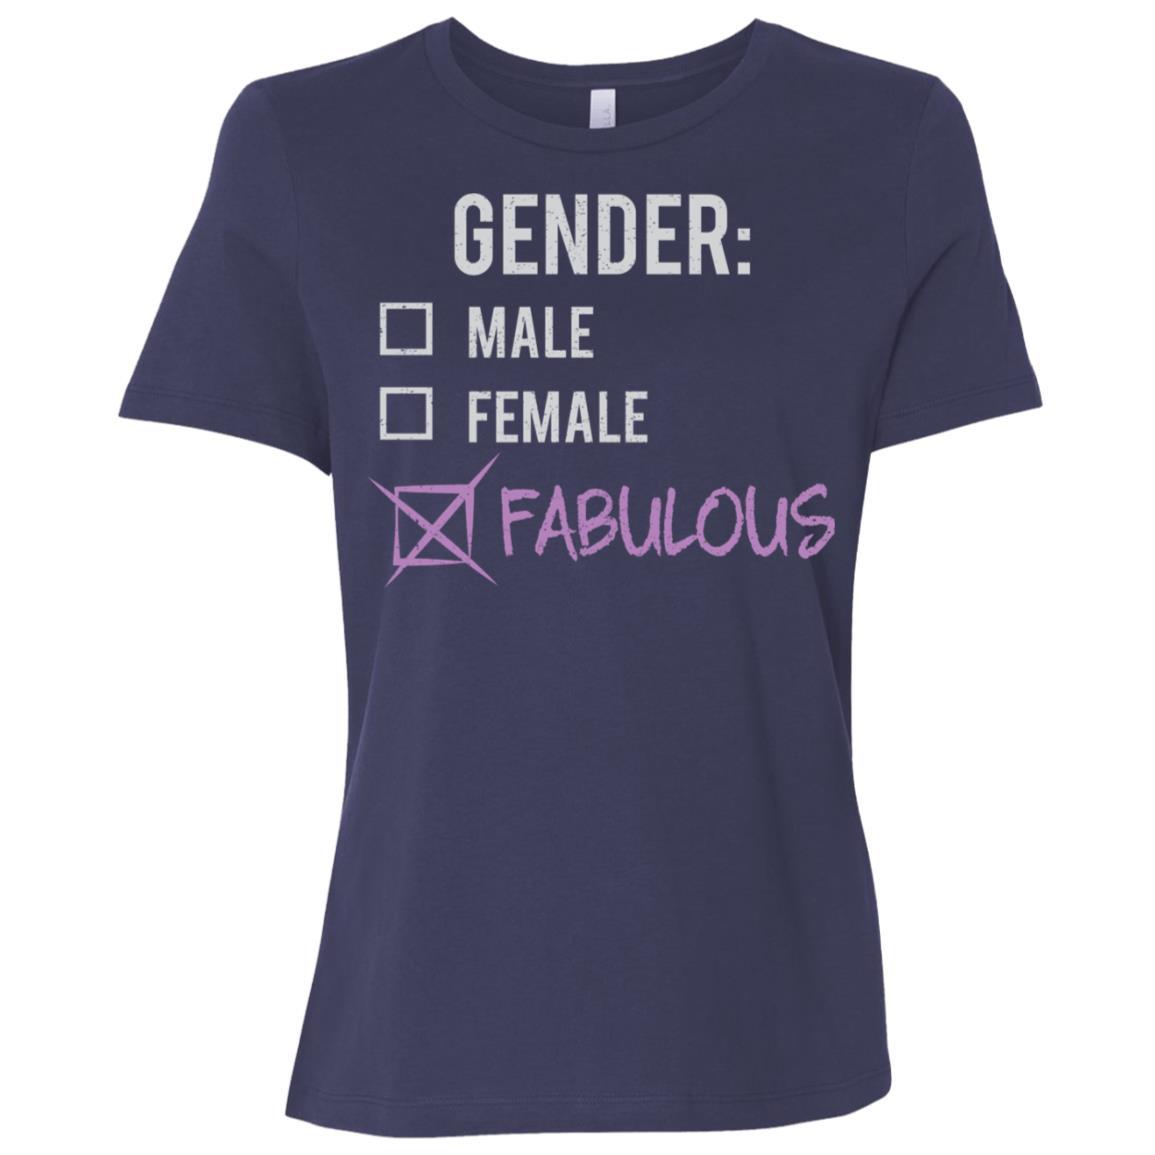 Male Female Fabulous Gender Nonbinary Trans Women Short Sleeve T-Shirt